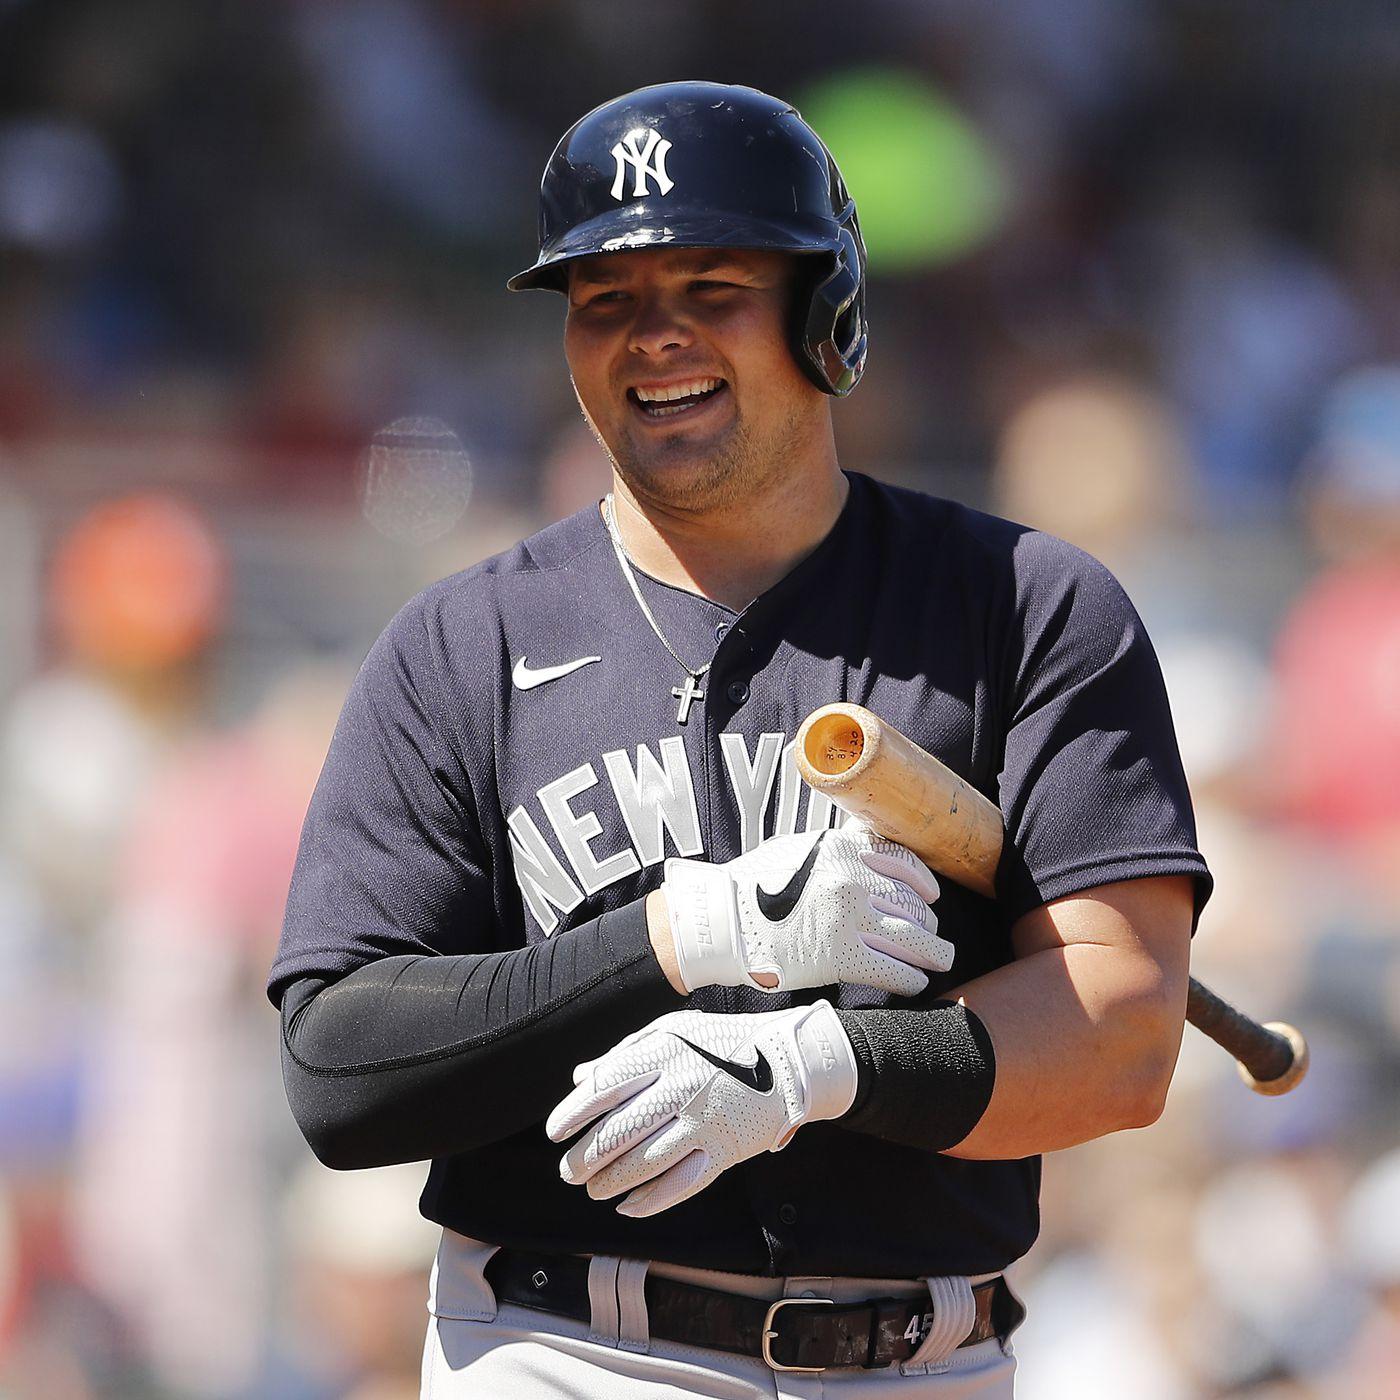 Yankees Social Media Spotlight: Yanks prepare for spring Training ...